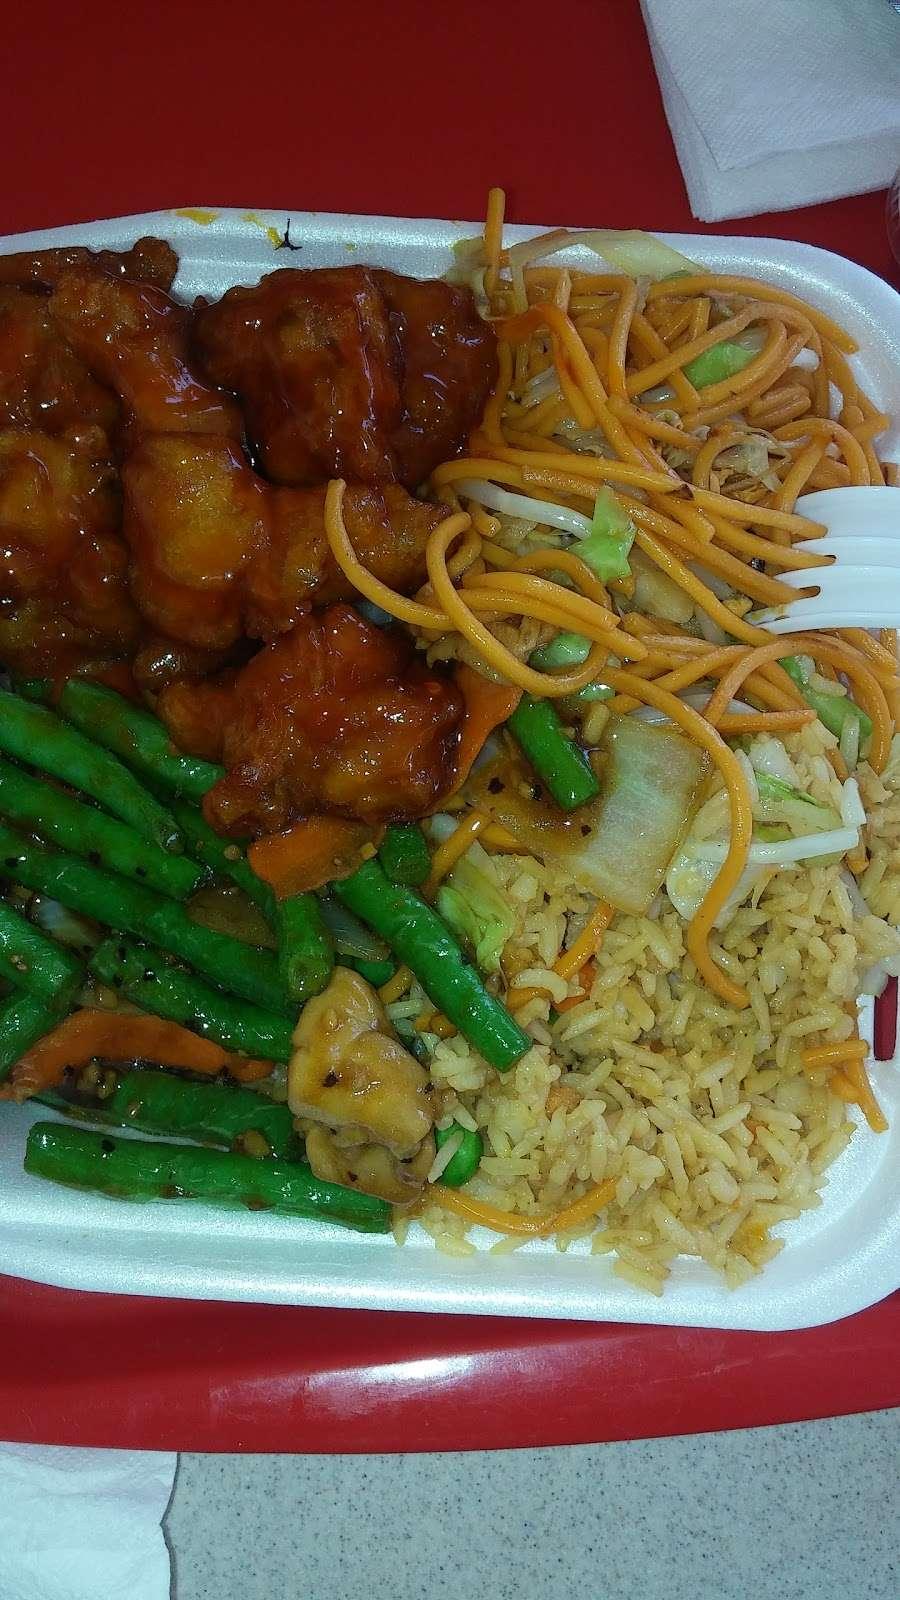 Hong Kong Express - restaurant    Photo 7 of 10   Address: 1407 E Gage Ave # A, Los Angeles, CA 90001, USA   Phone: (323) 588-9078